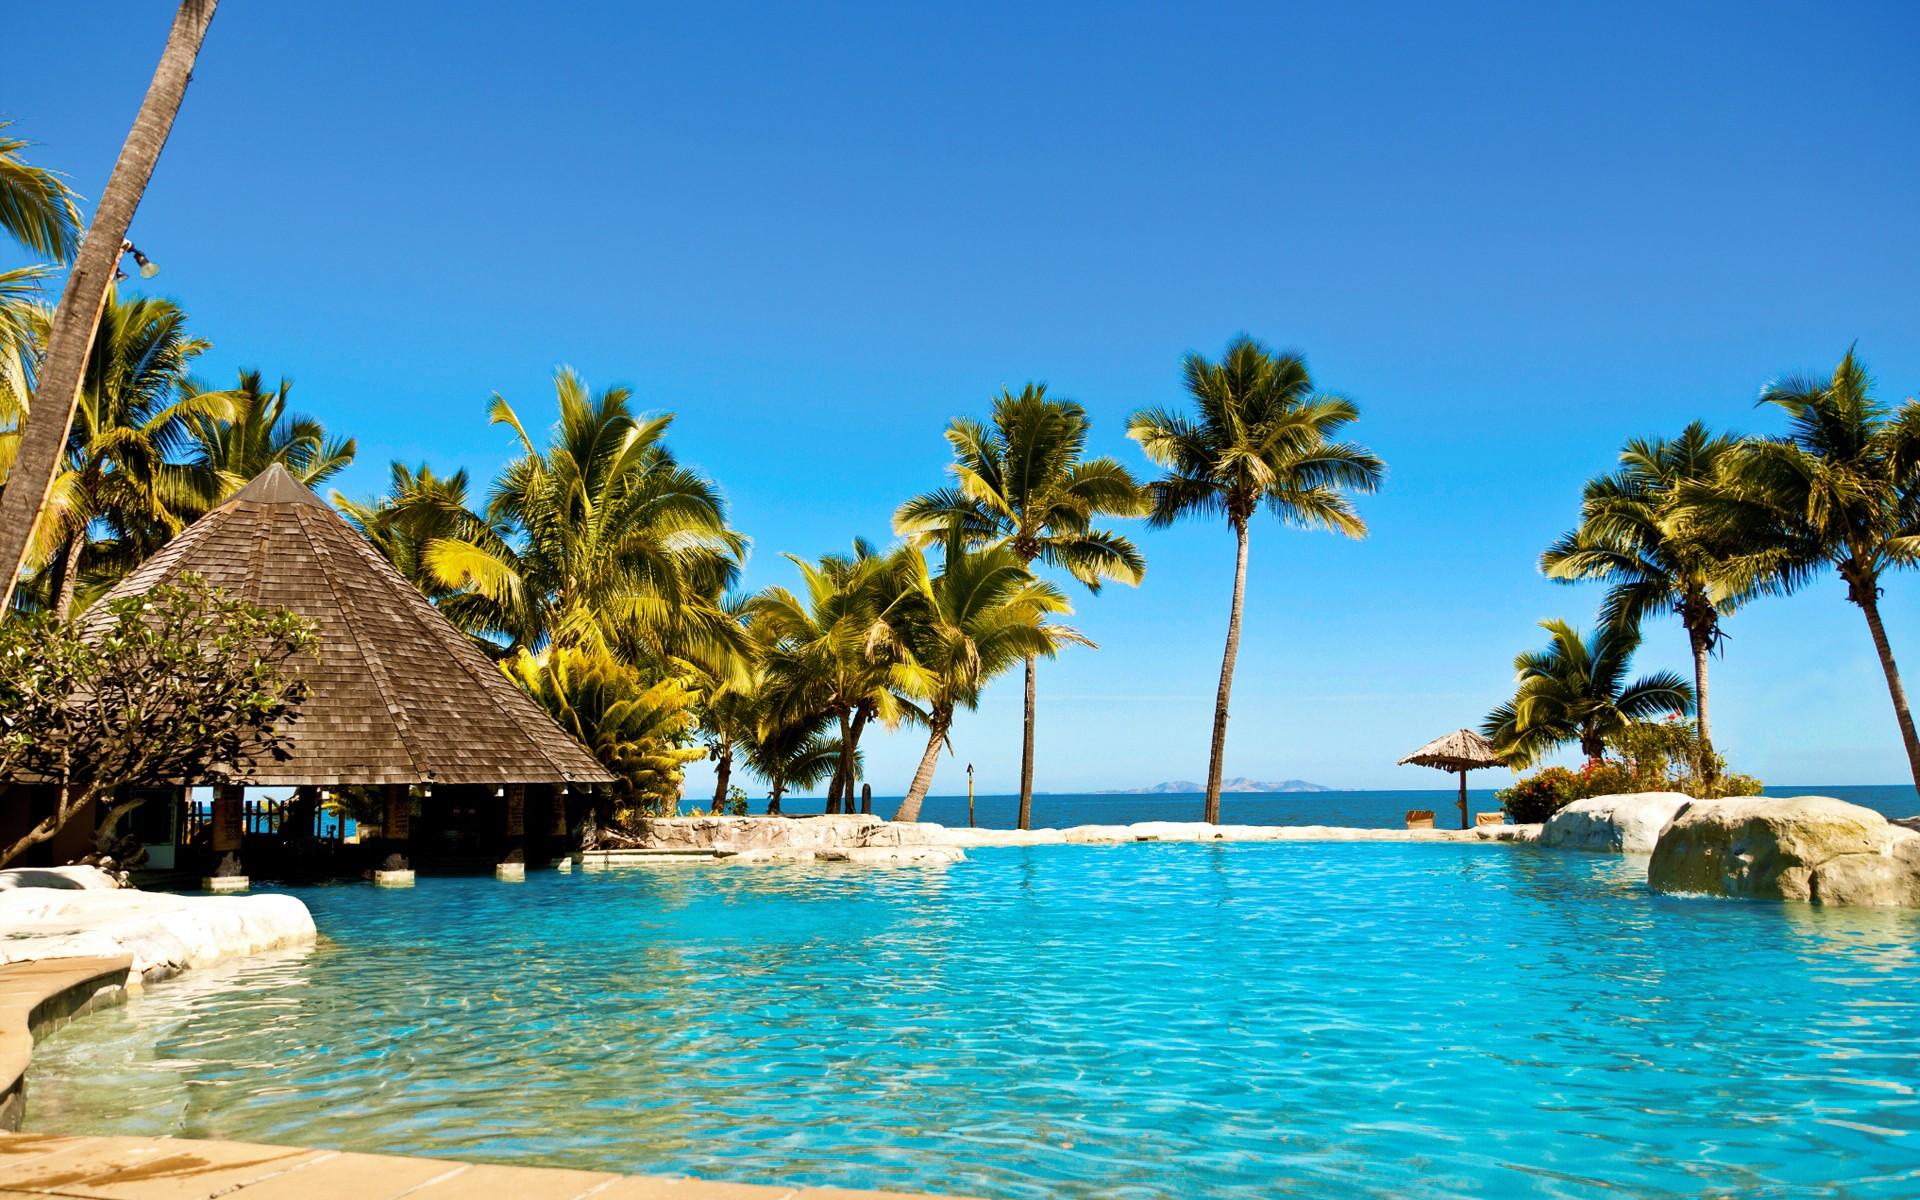 tropical resort wallpaper wallpapersafari. Black Bedroom Furniture Sets. Home Design Ideas